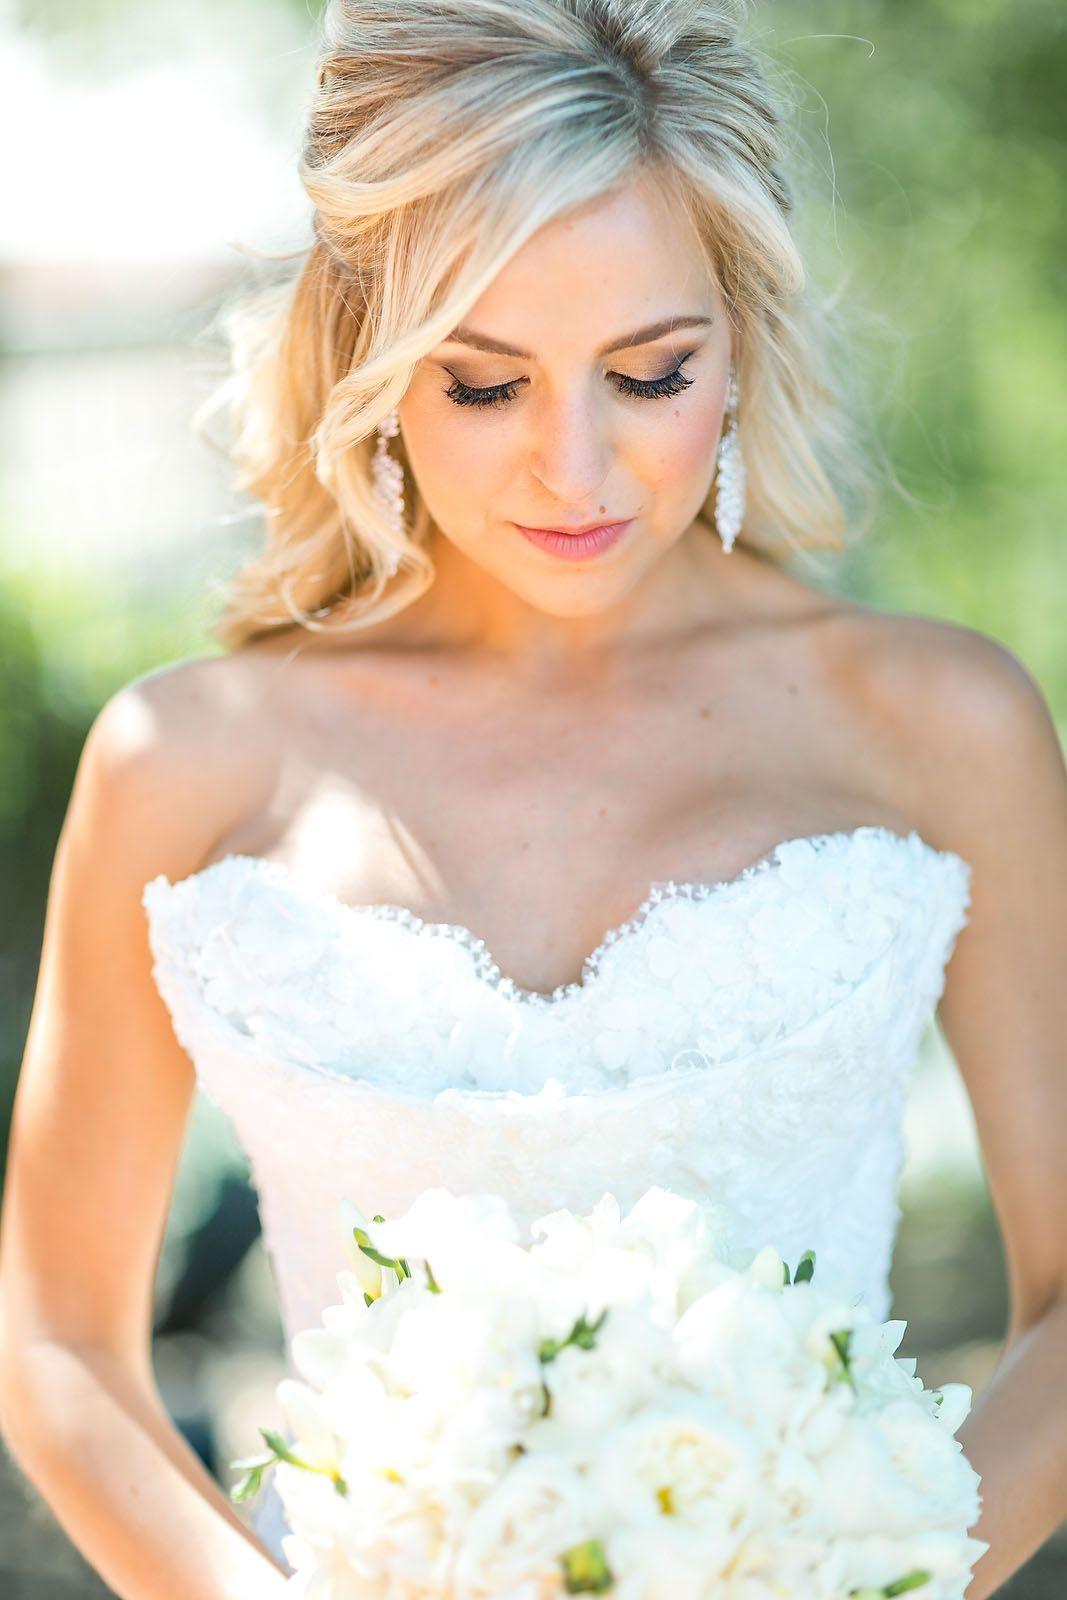 Bridal makeup artist for clippers spirit dance team member